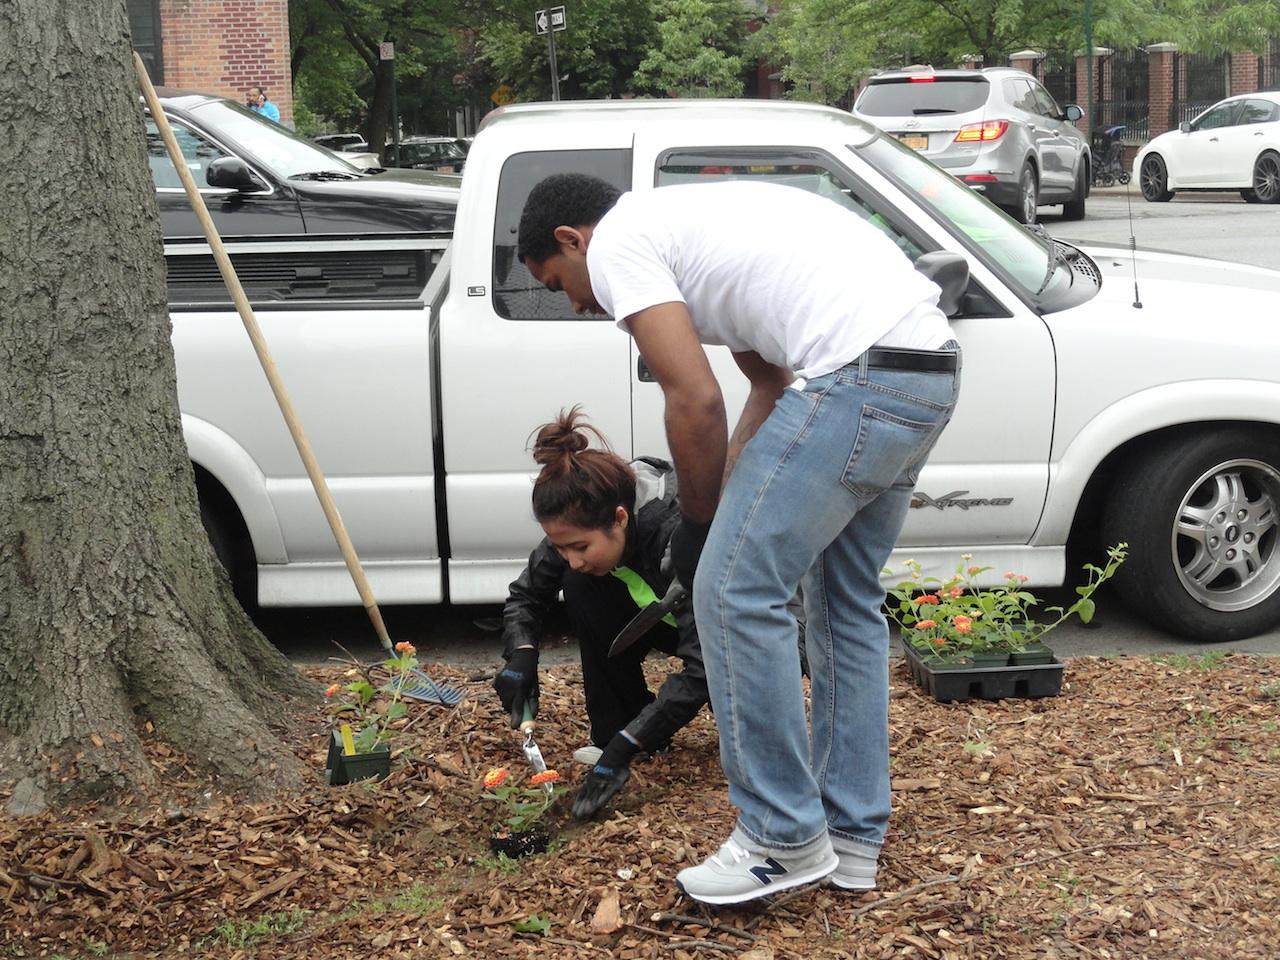 Tree census kicks off in Hunts Point